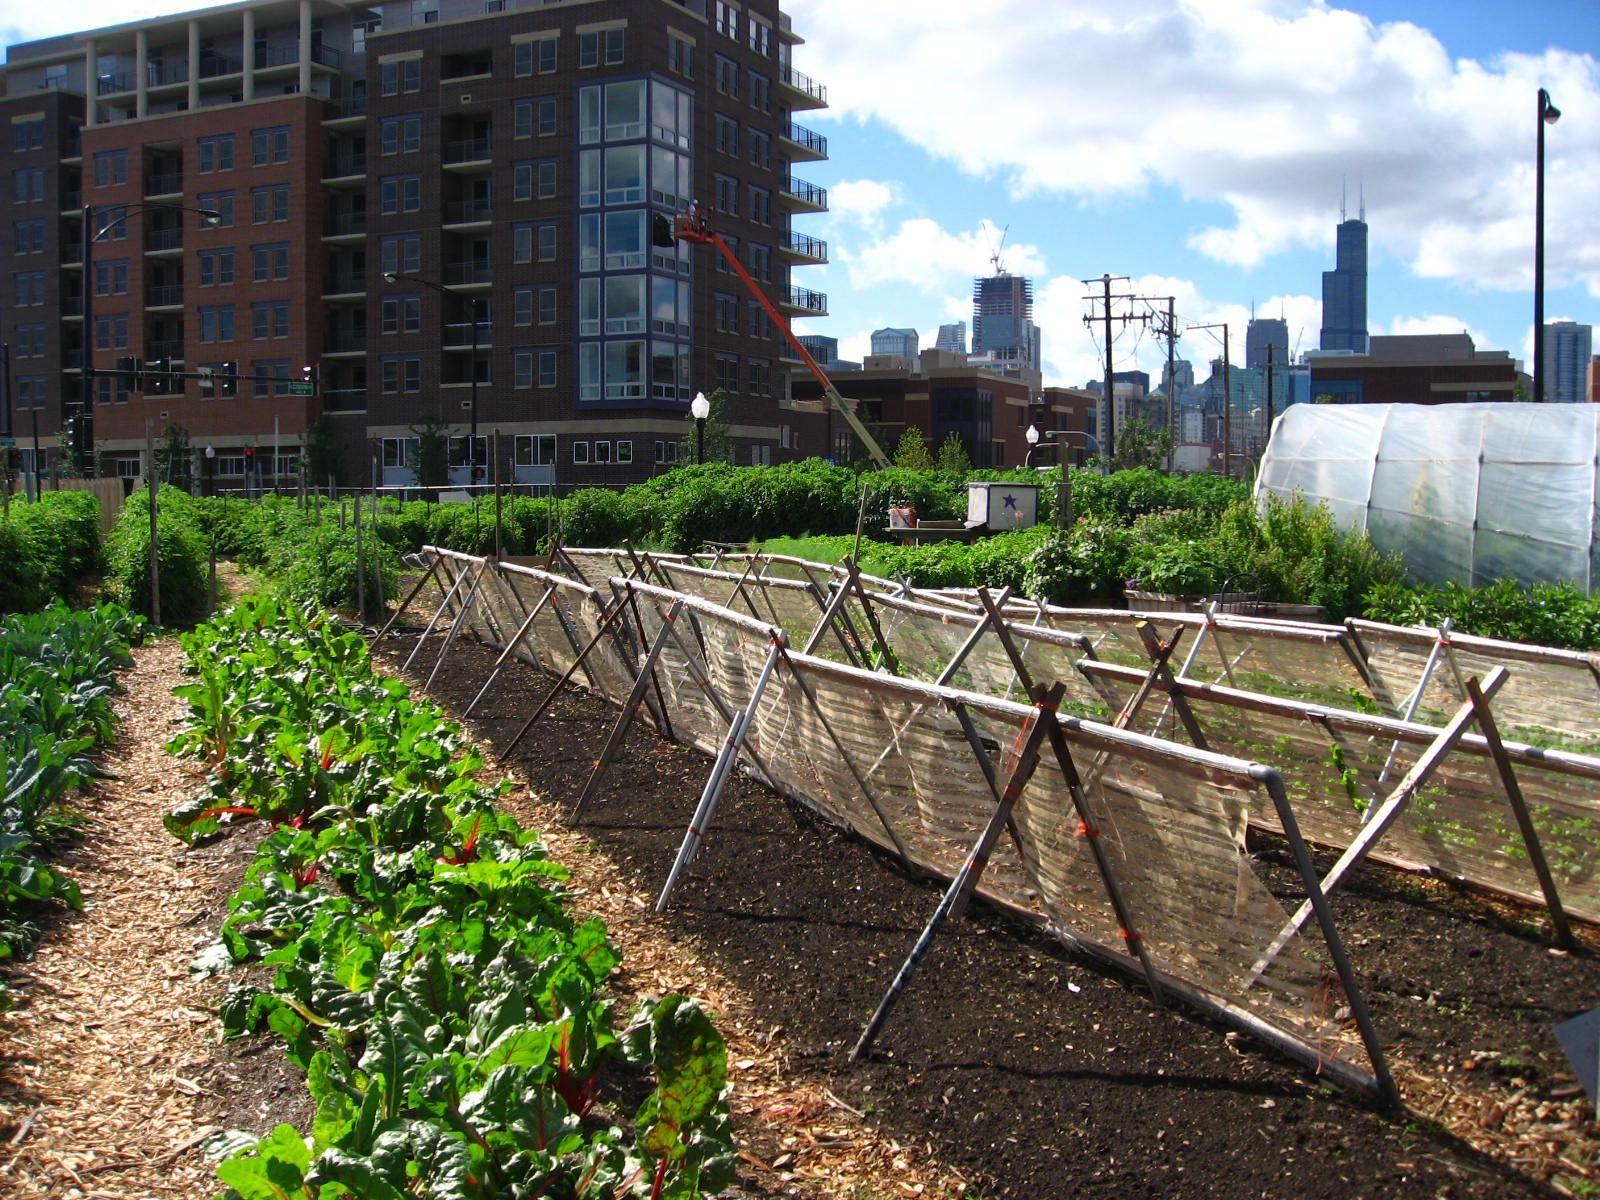 urban agriculture wikipedia the free encyclopedia urban